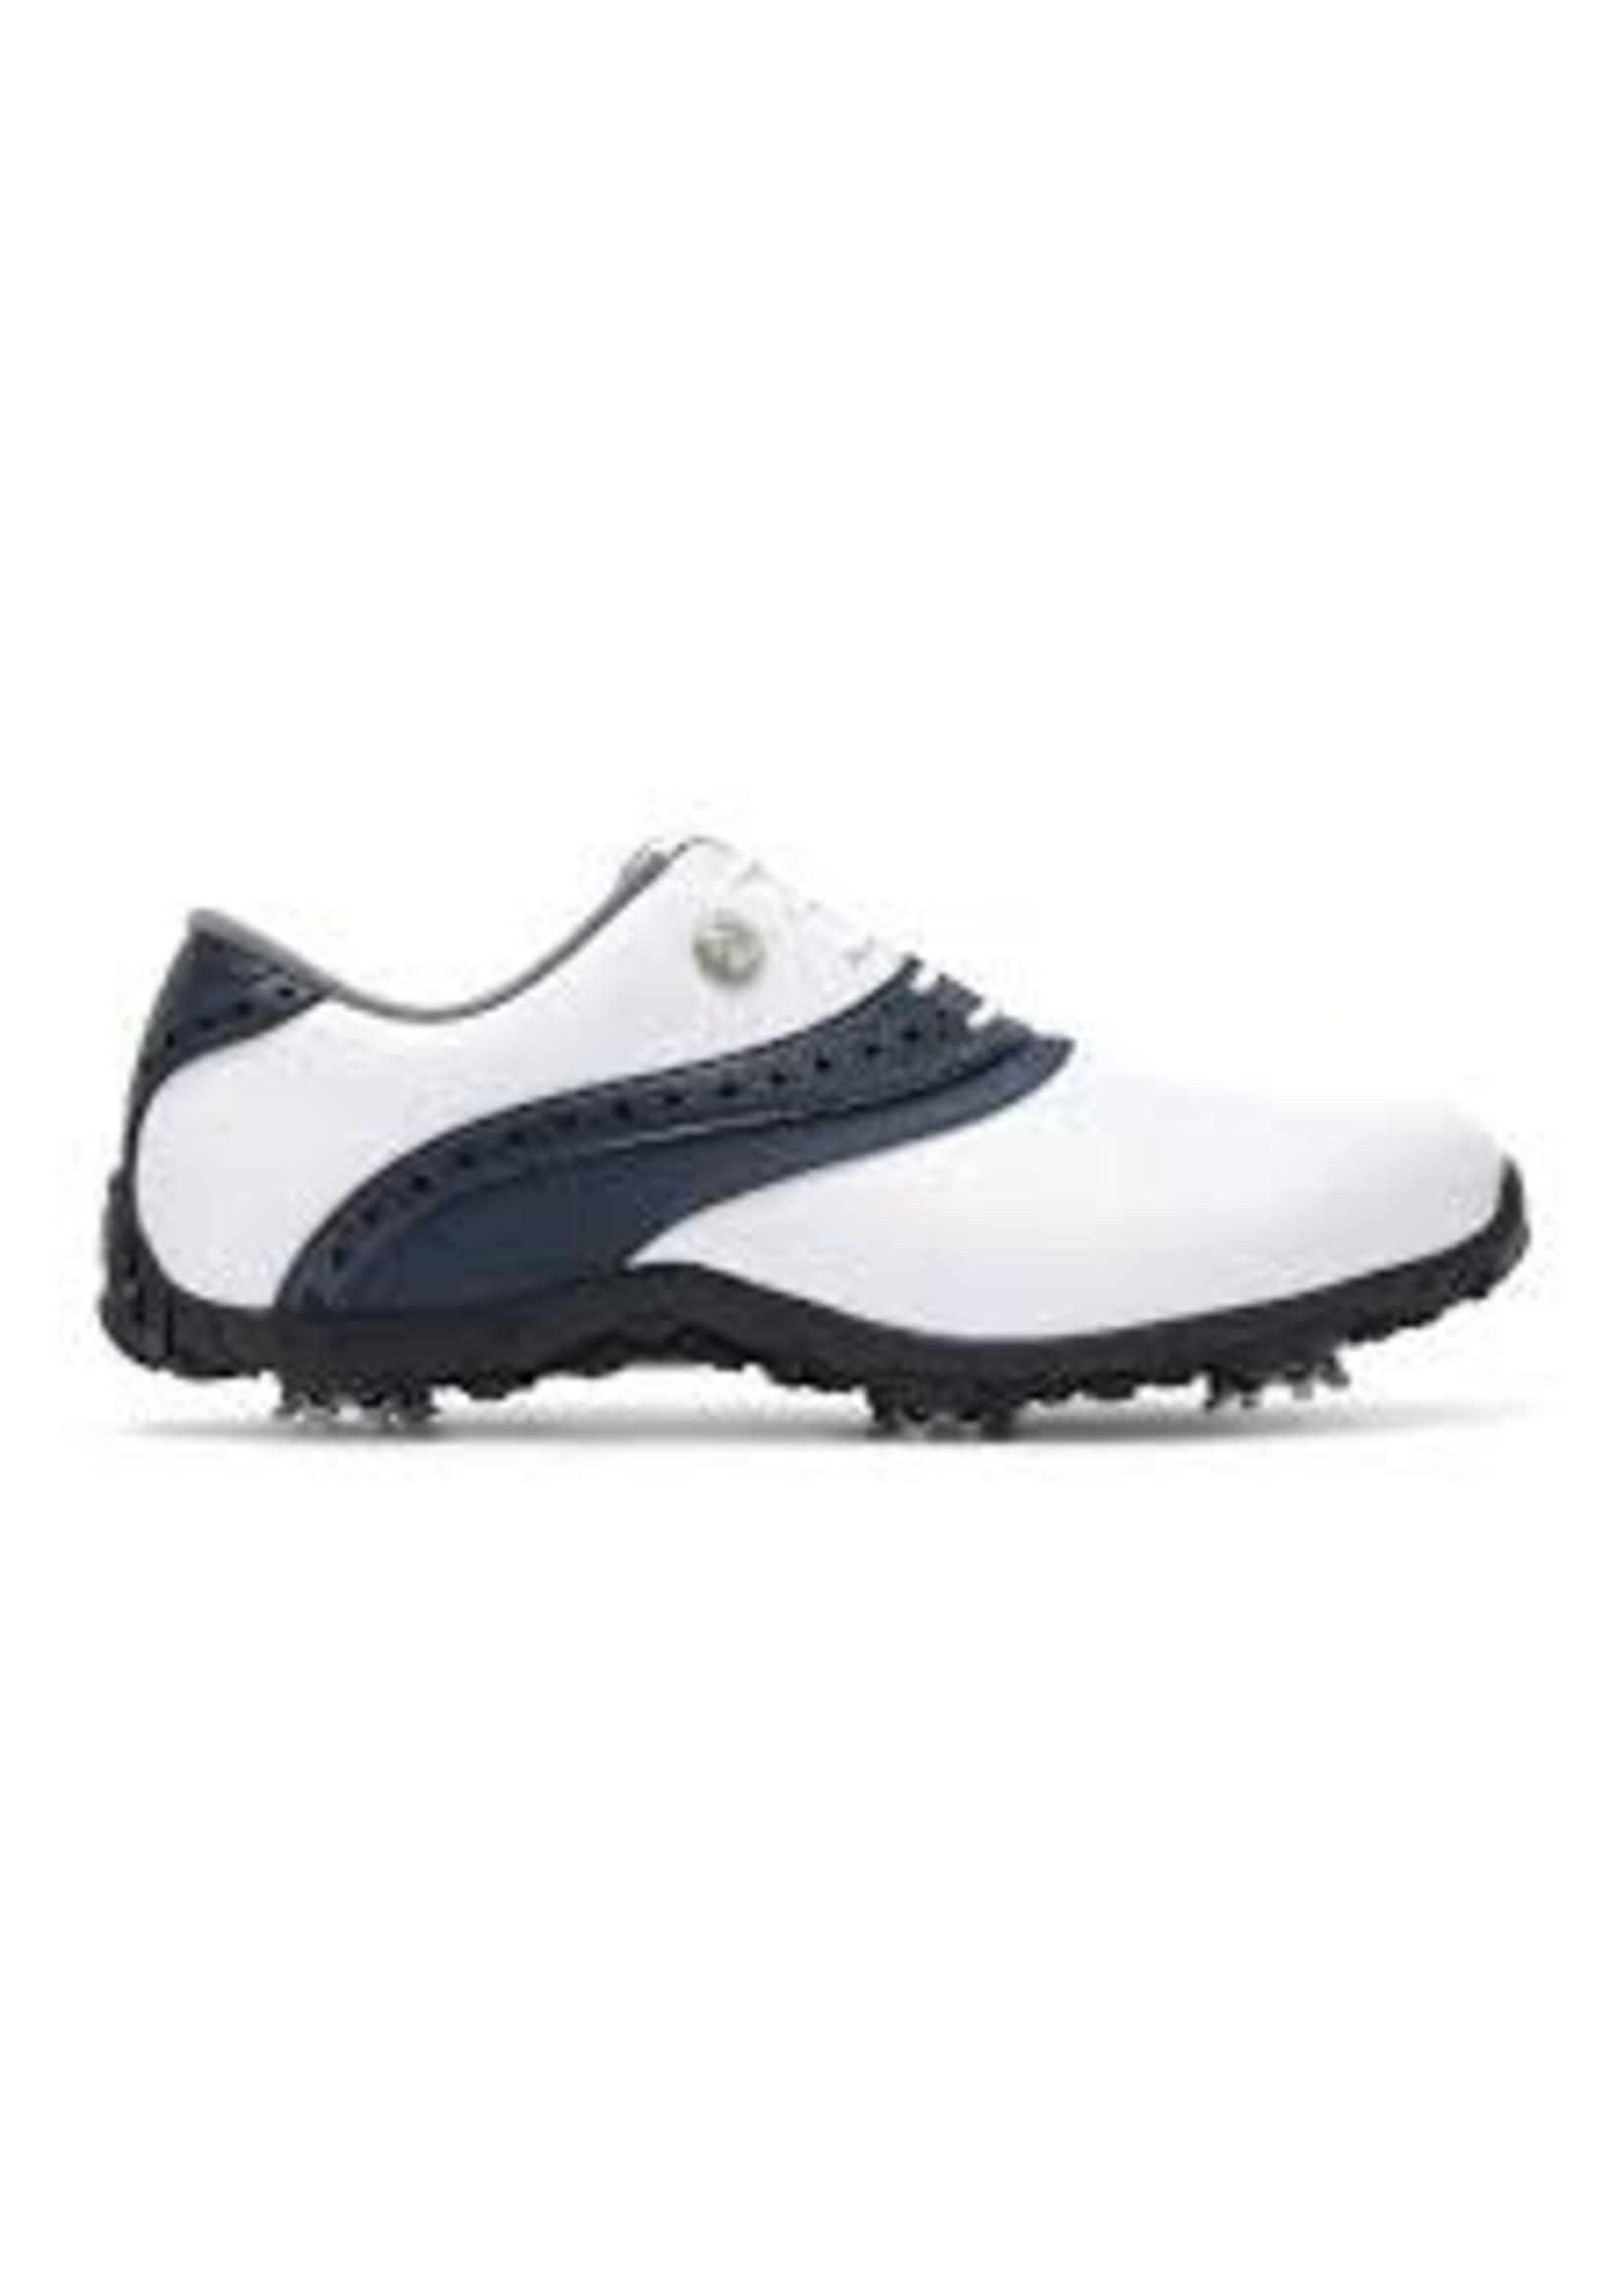 Footjoy Footjoy Arc LP Ladies Golf Shoe (2019)